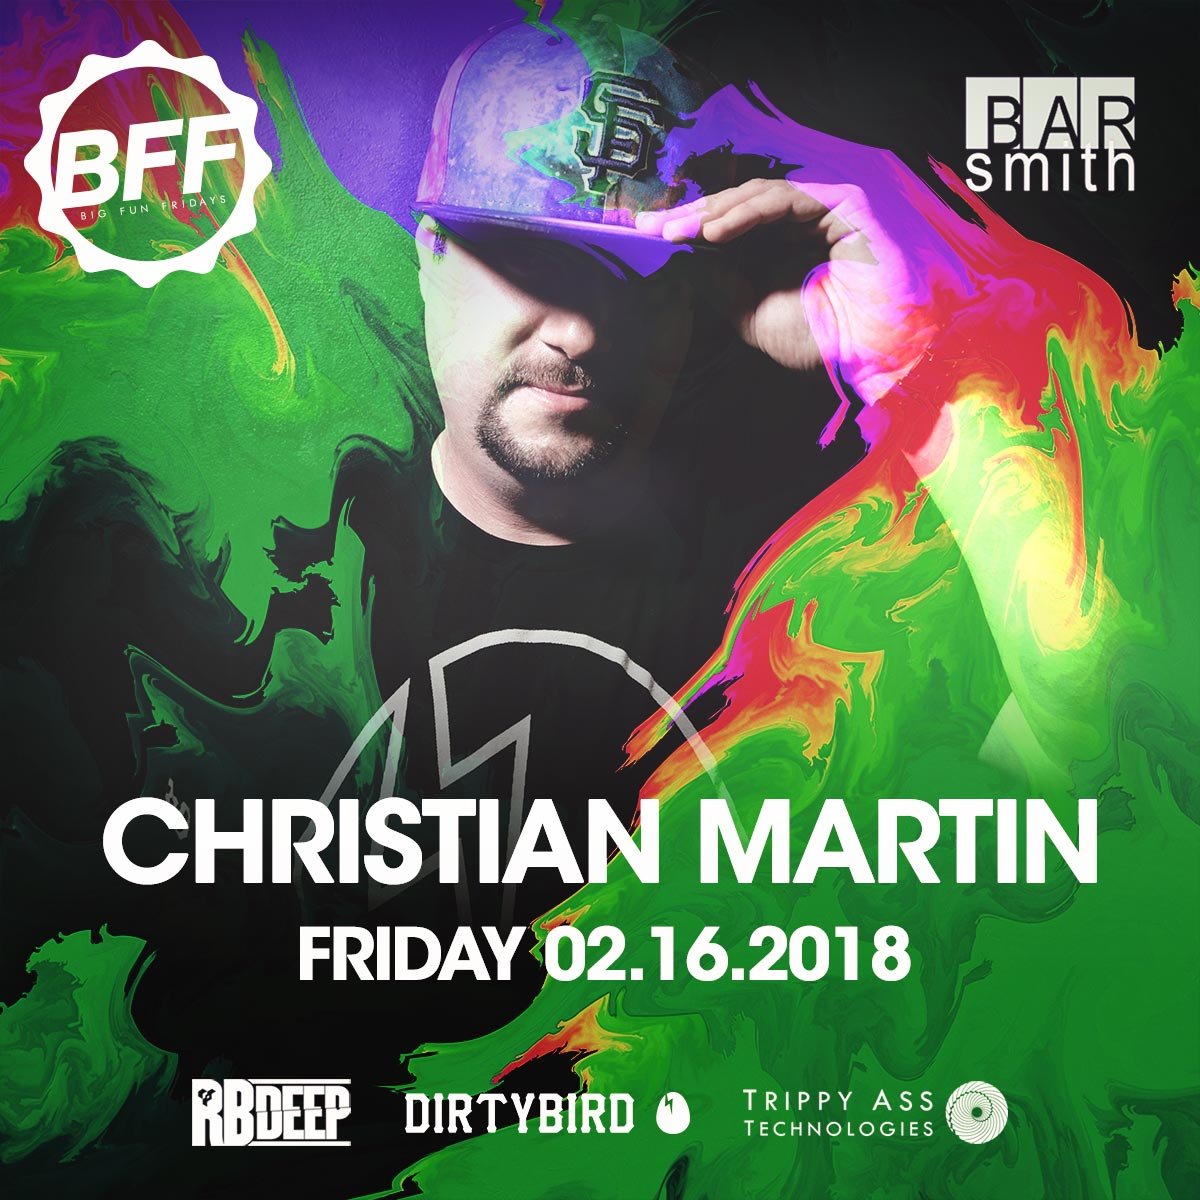 Flyer for Christian Martin - BFF